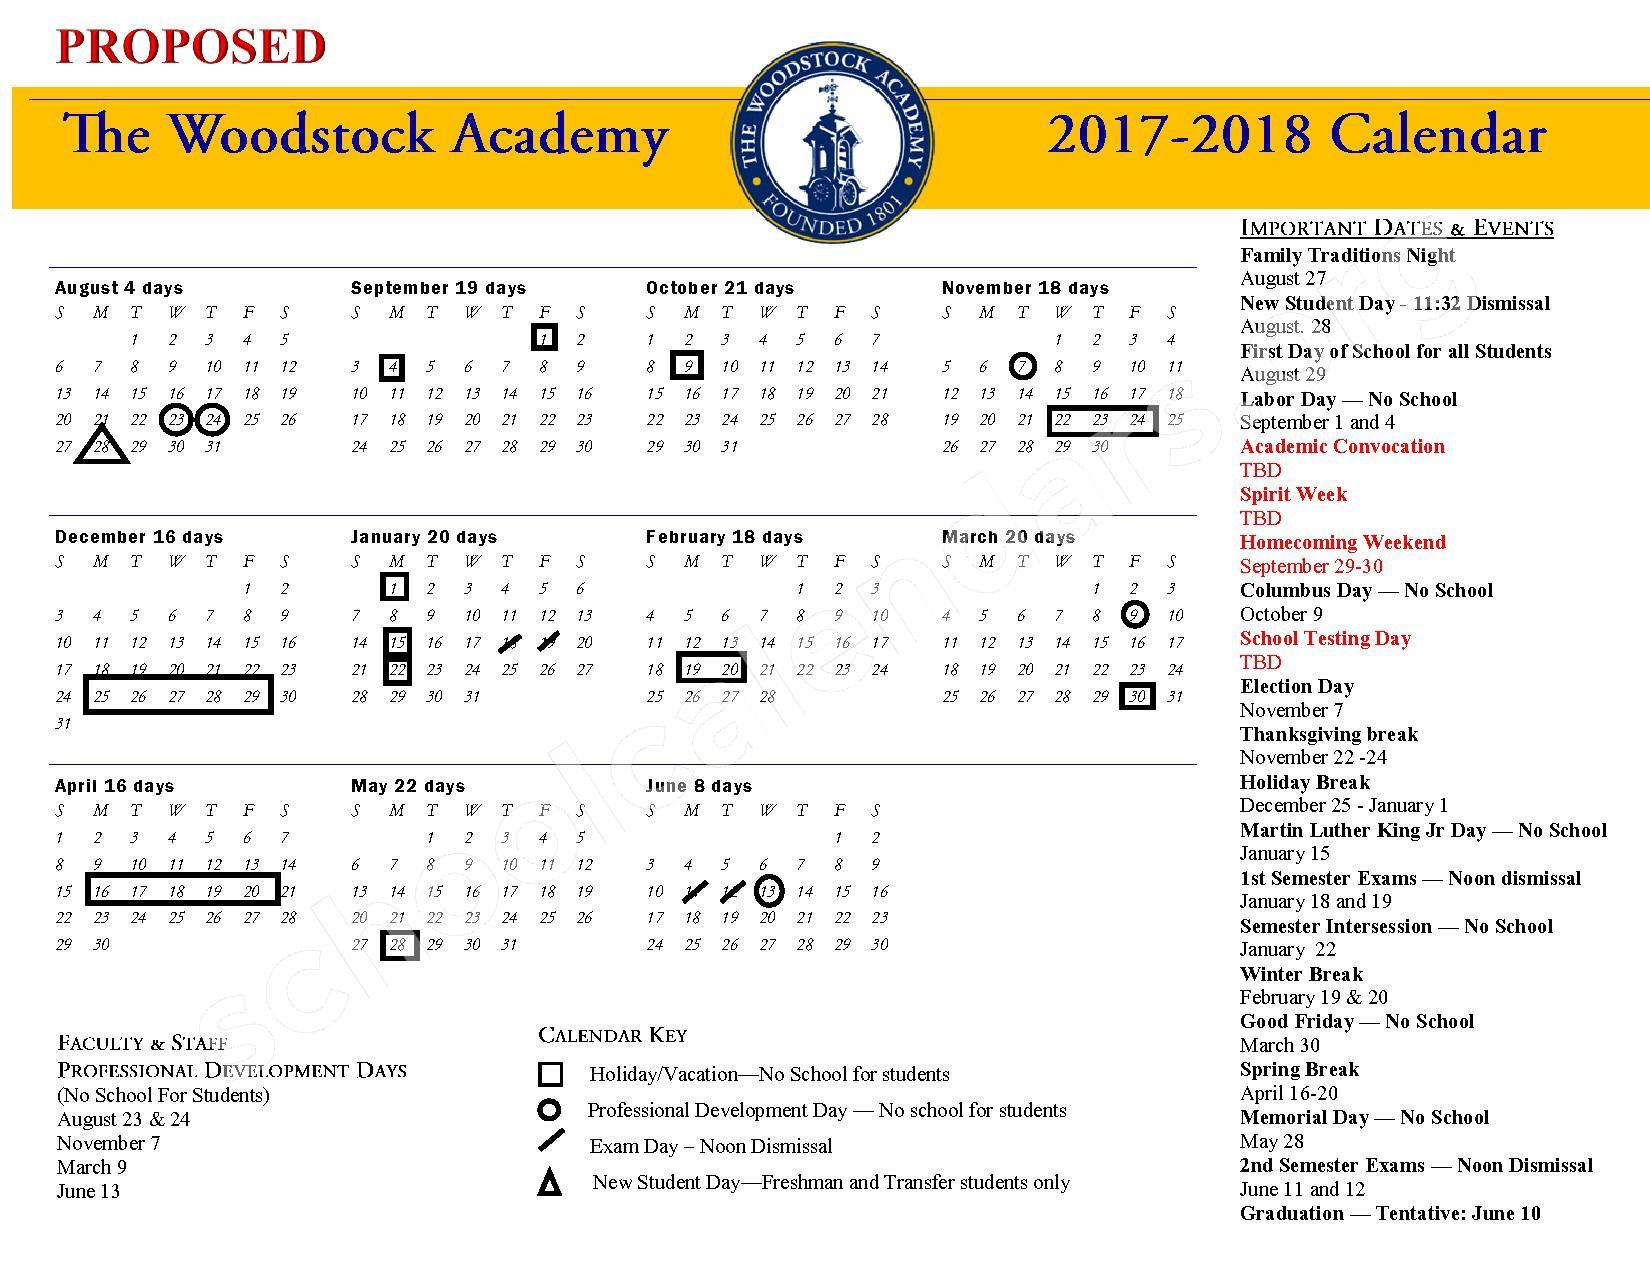 2017 - 2018 School Calendar – Woodstock Academy – page 1